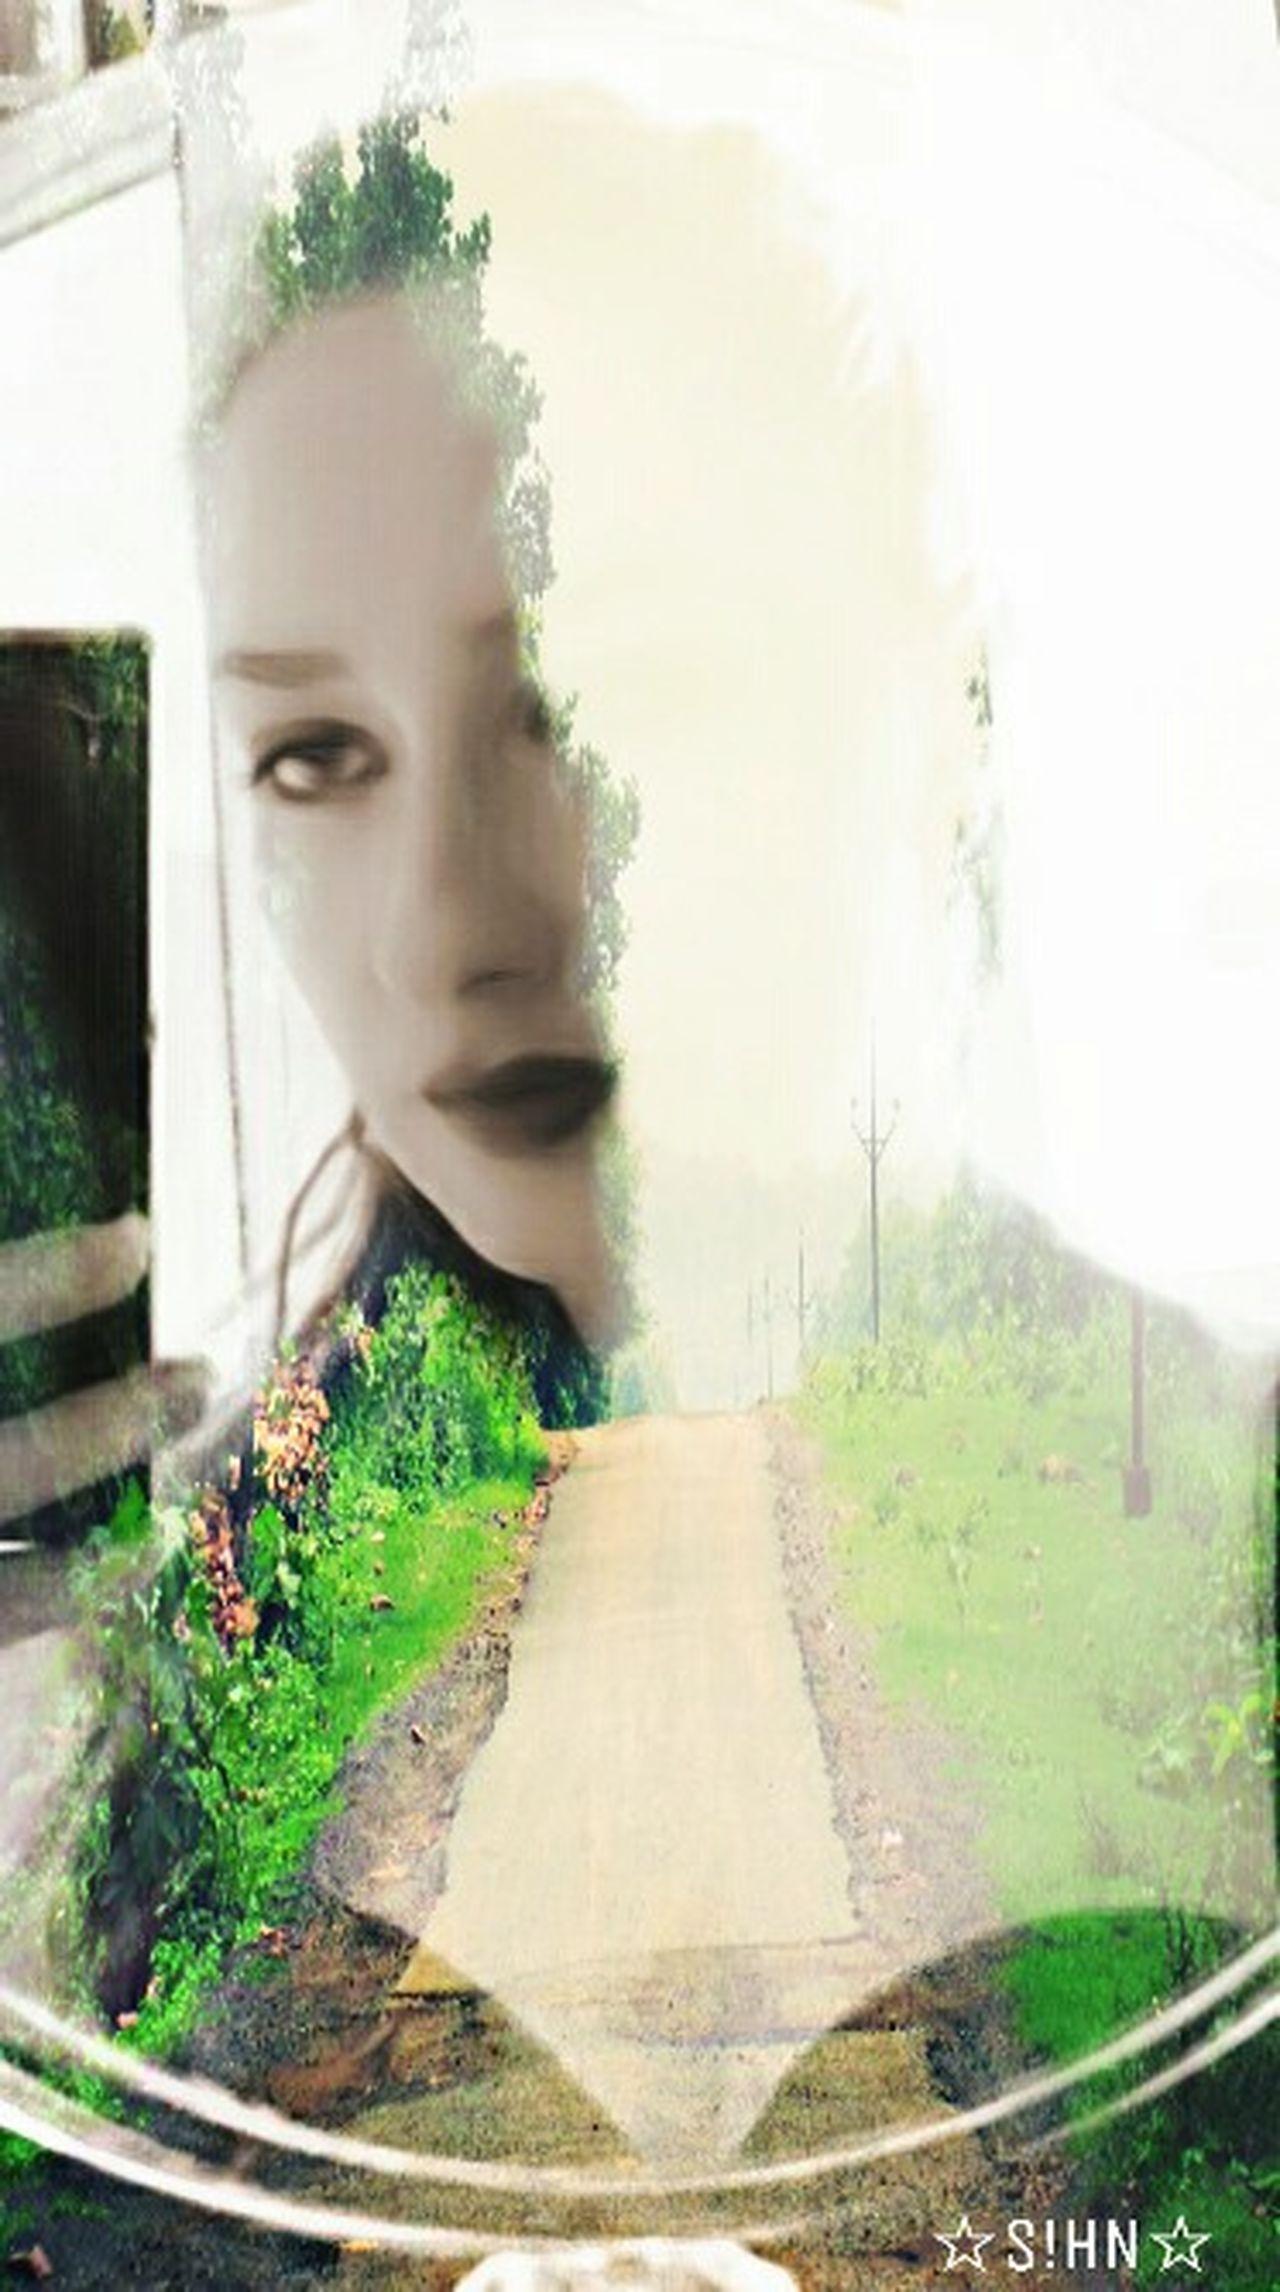 Self Portrait MYArtwork❤ EyeEm Best Edits Freetoedit Drawstepbystep Double Exposure Artistic Expression Masks My Photography Selfportrait Artisticselfie